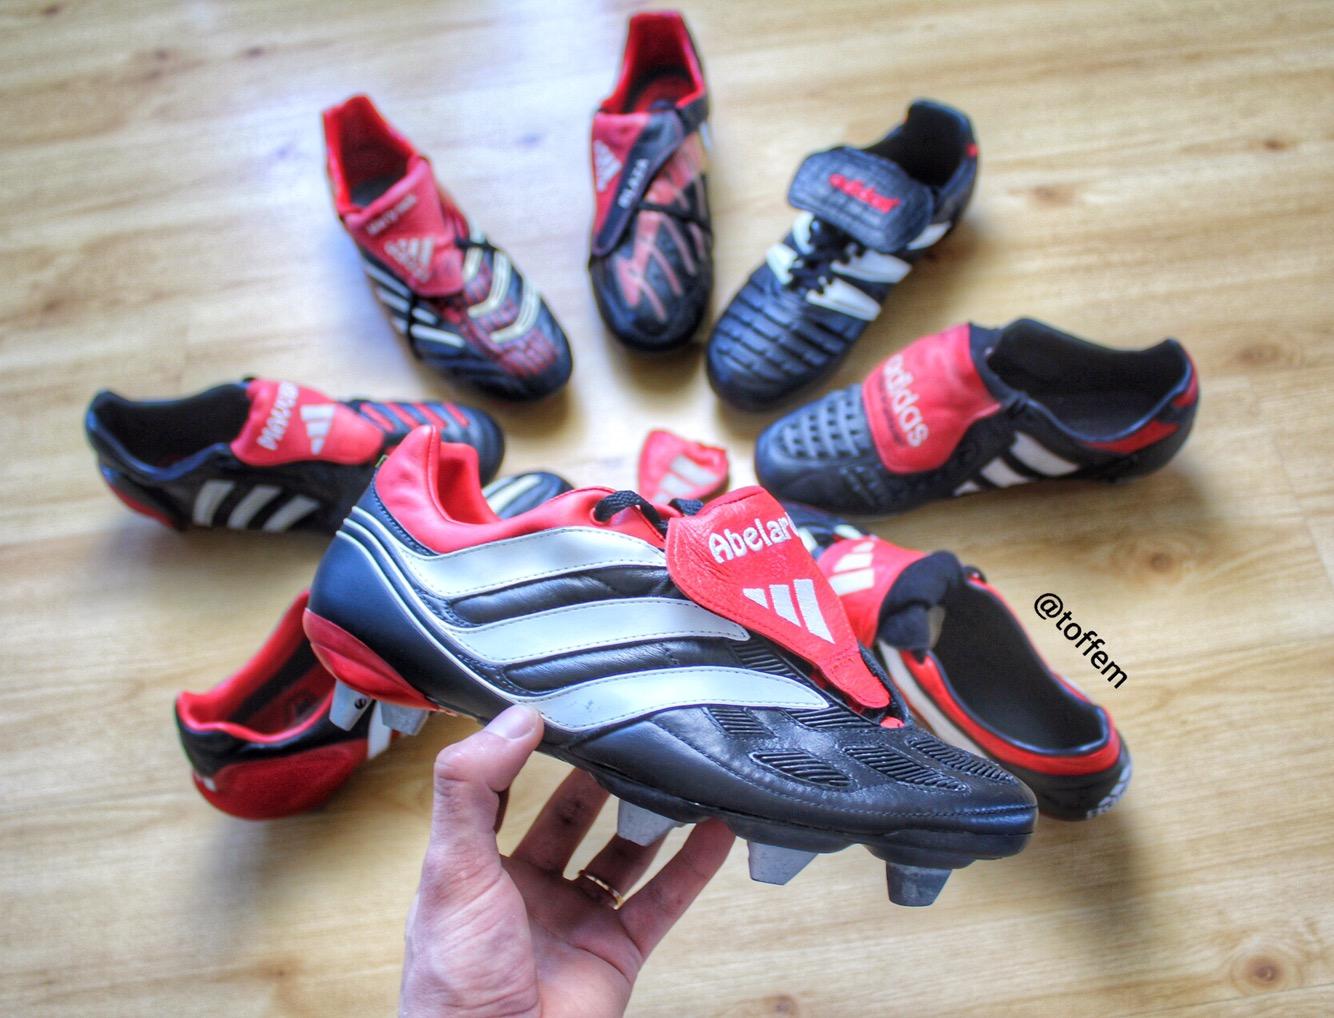 640b476b13422 Adidas Predator Mania Remake 2017 – Boots Vault